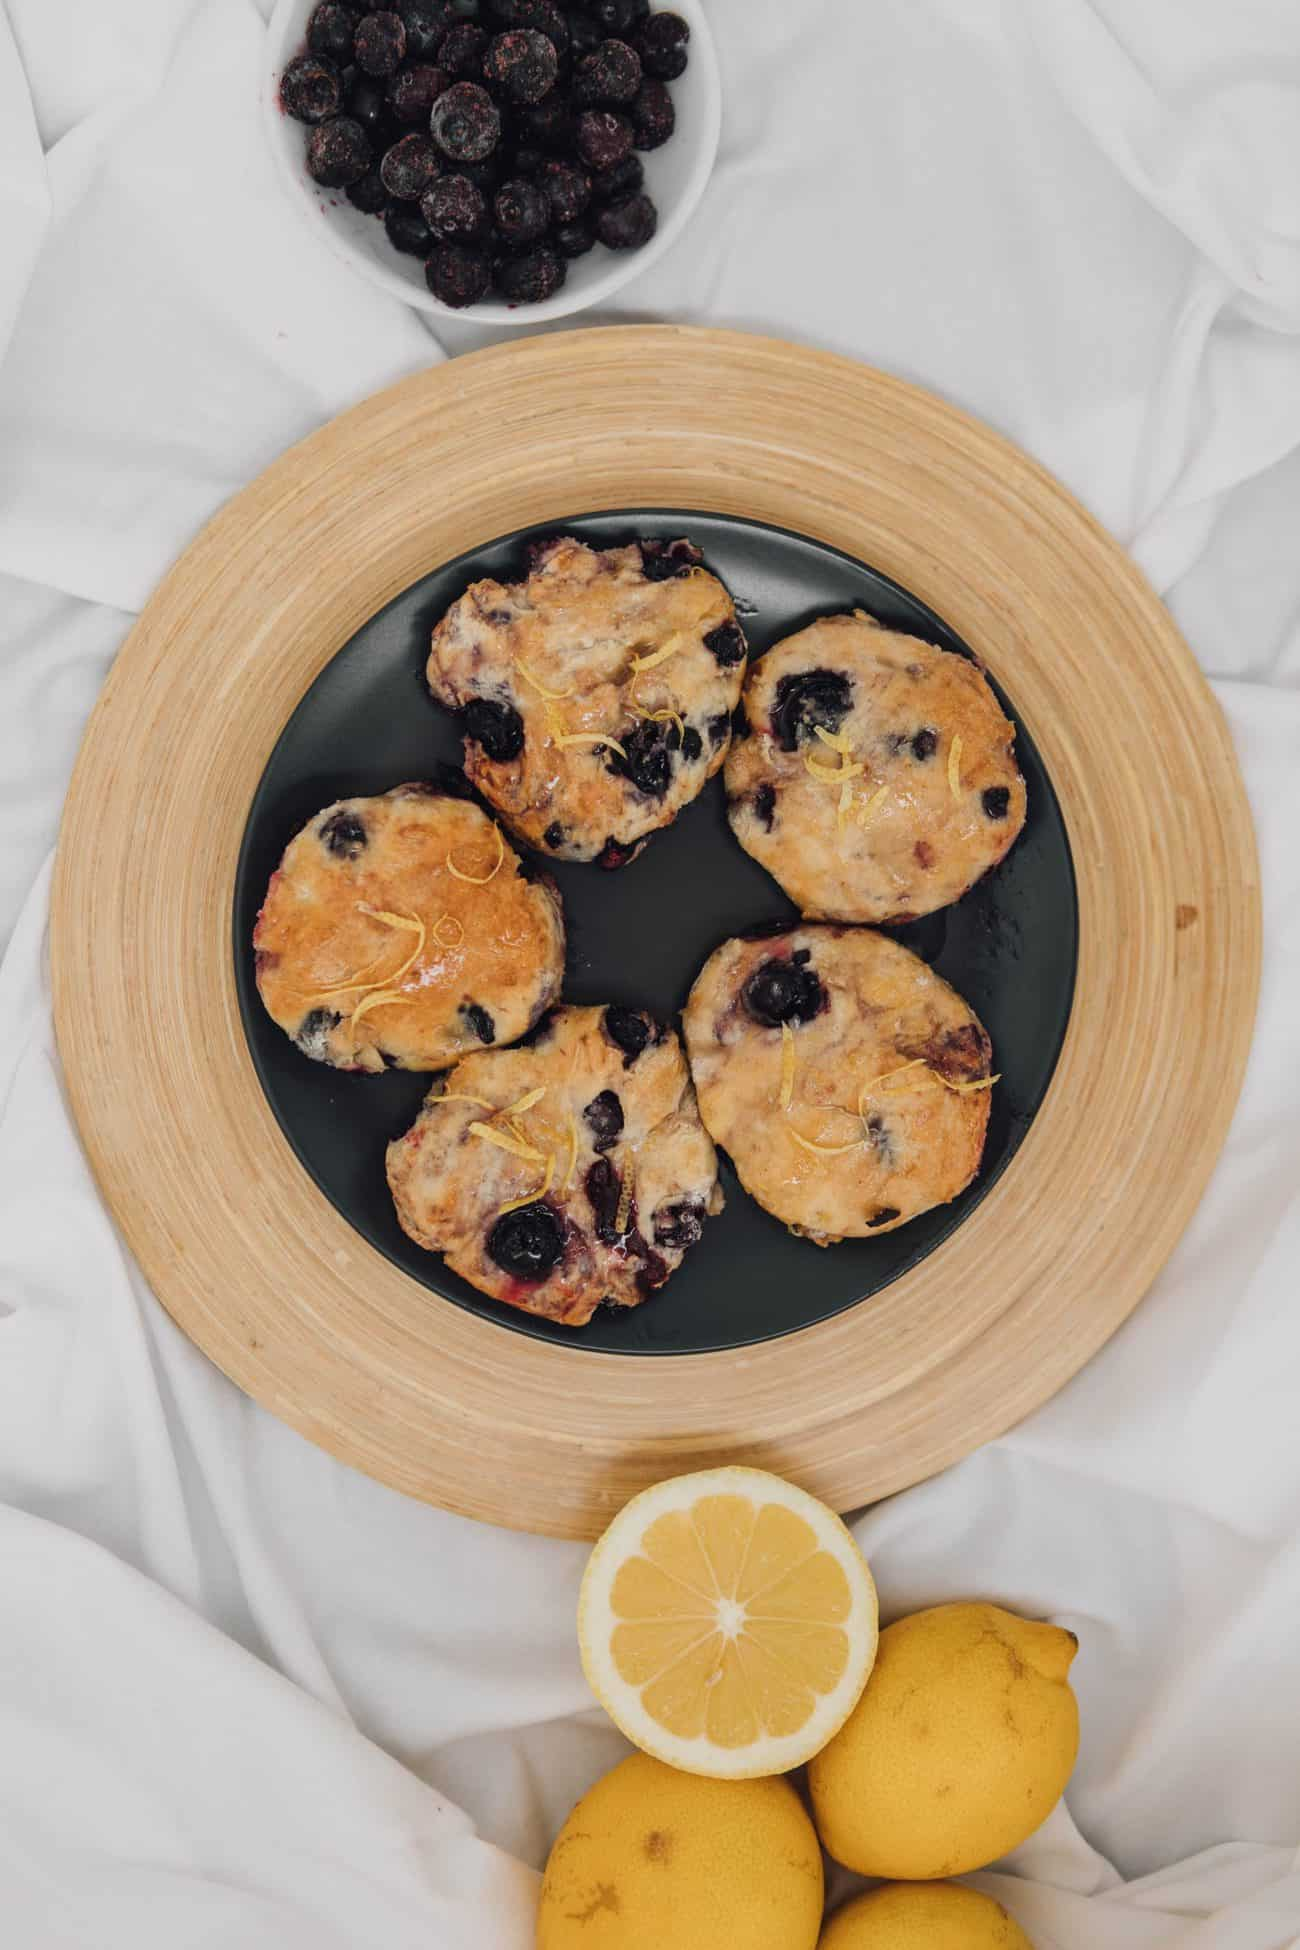 Grandma's Blueberry Glazed Biscuits